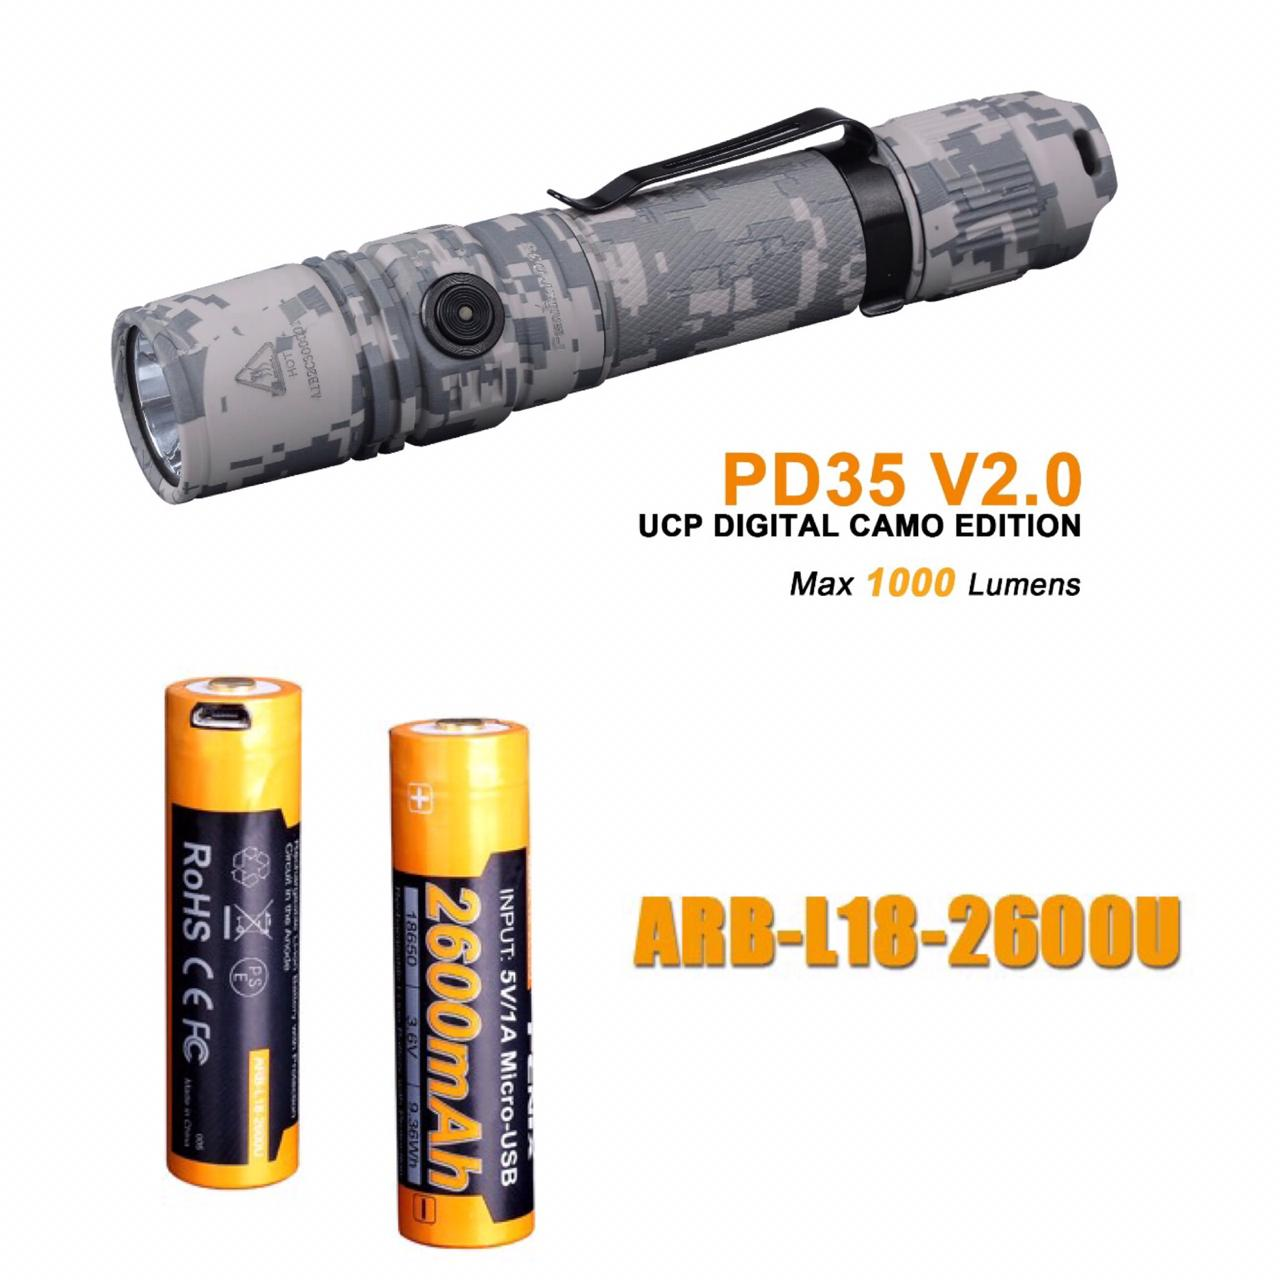 Lanterna Fenix PD35 Camuflada + Bateria 2600mAh USB  - OFERTA EXCLUSIVA